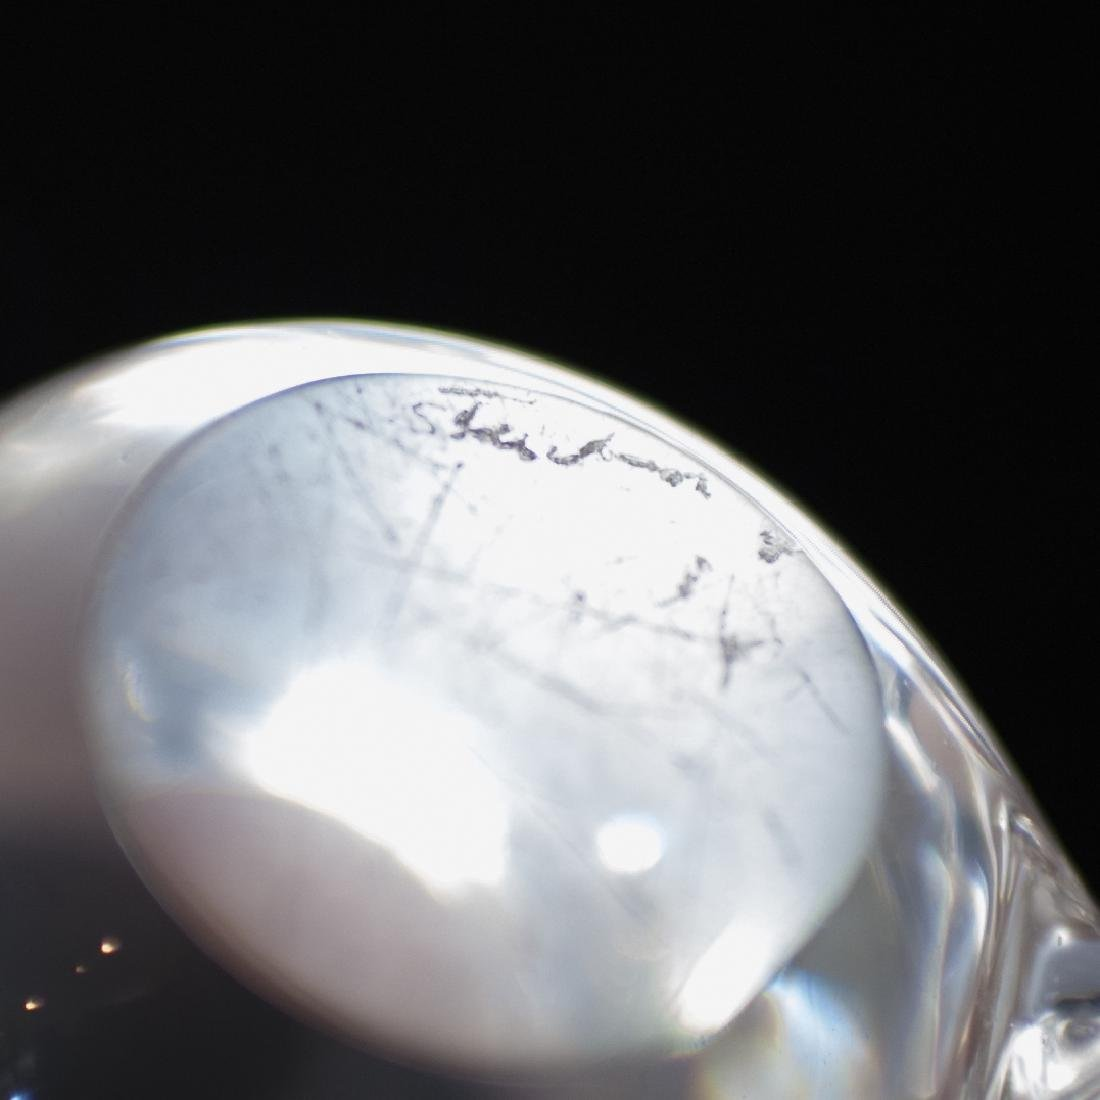 Steuben Crystal Penguin Paperweight - 2